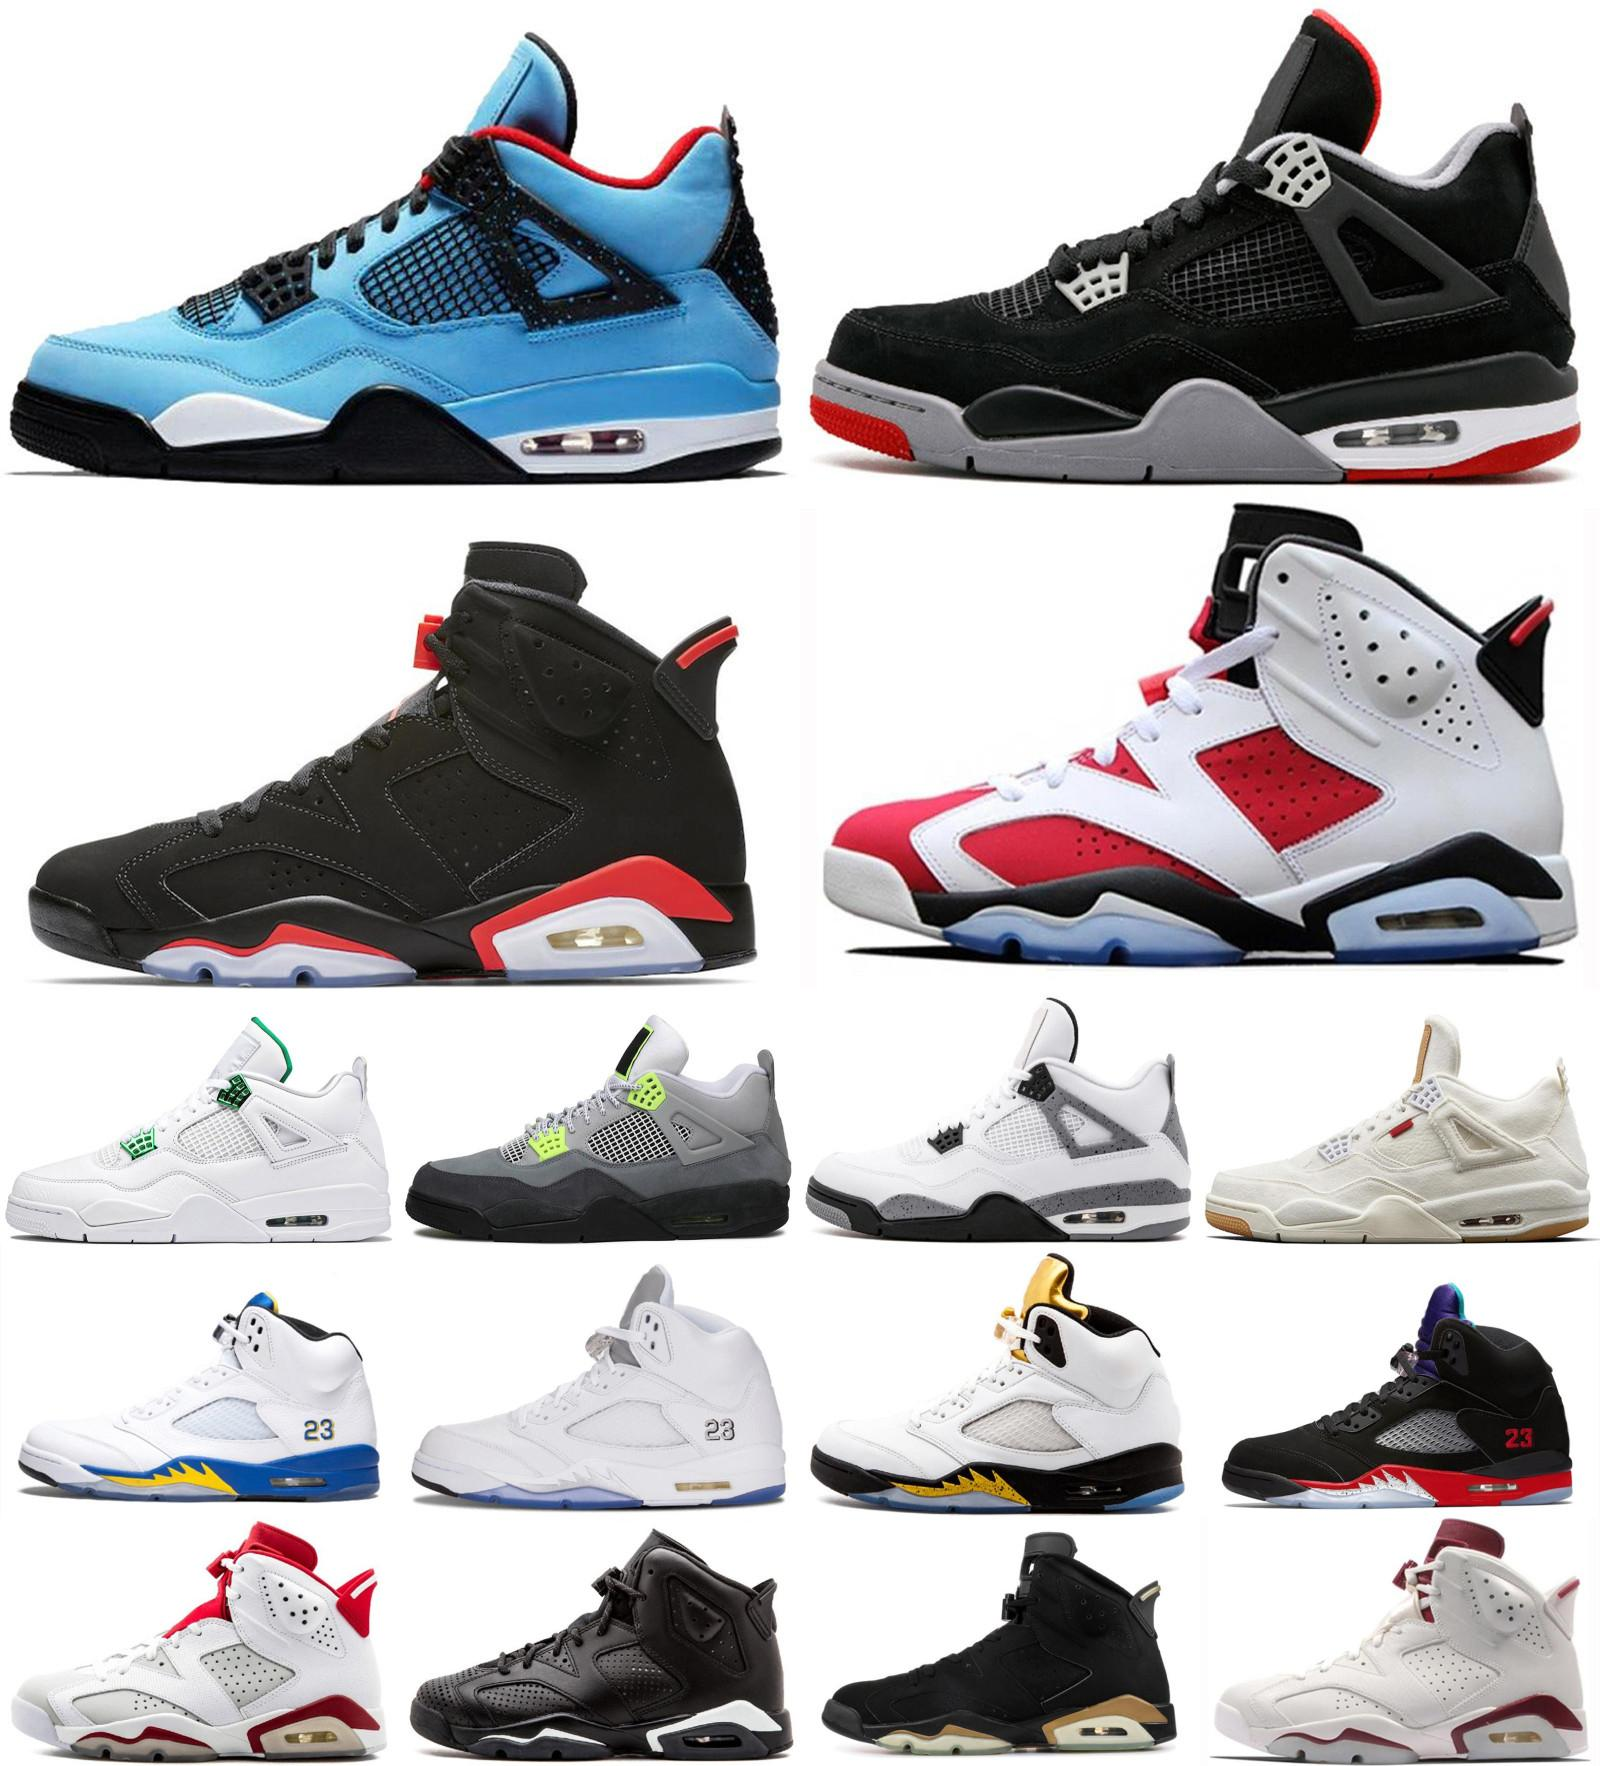 Nike Air Max Retro Jordan Shoes أحذية كرة السلة الجديدة 5 الدولية بدلة الطيران الأزرق جلد الغميض الرمادي Og أسود Metalic Cdp أحذية رياضية 7-13